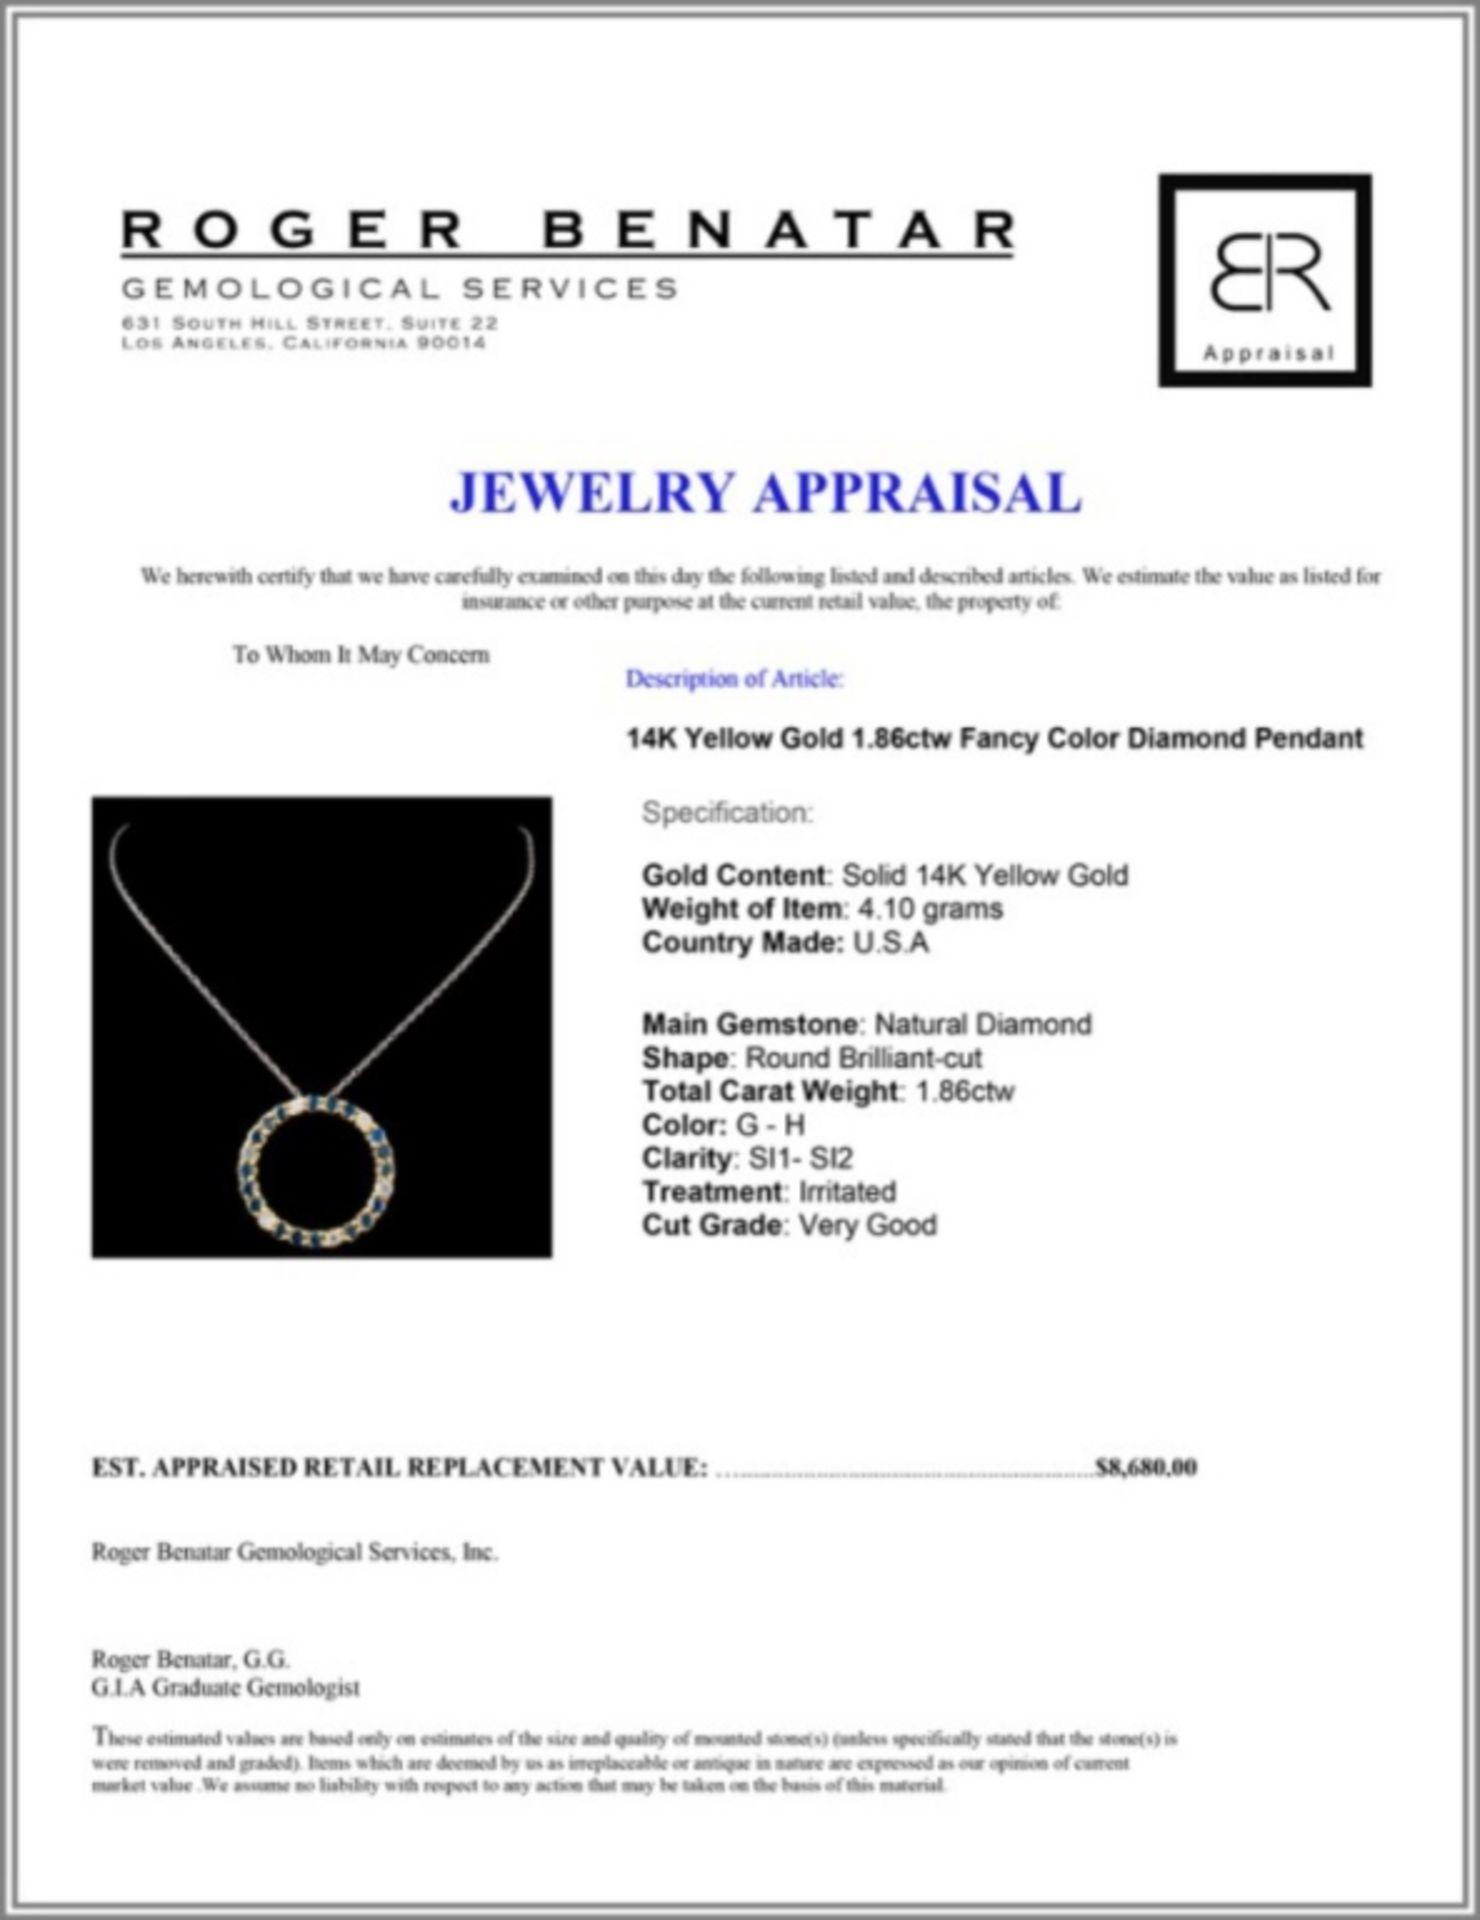 14K Yellow Gold 1.86ctw Fancy Color Diamond Pendan - Image 3 of 3